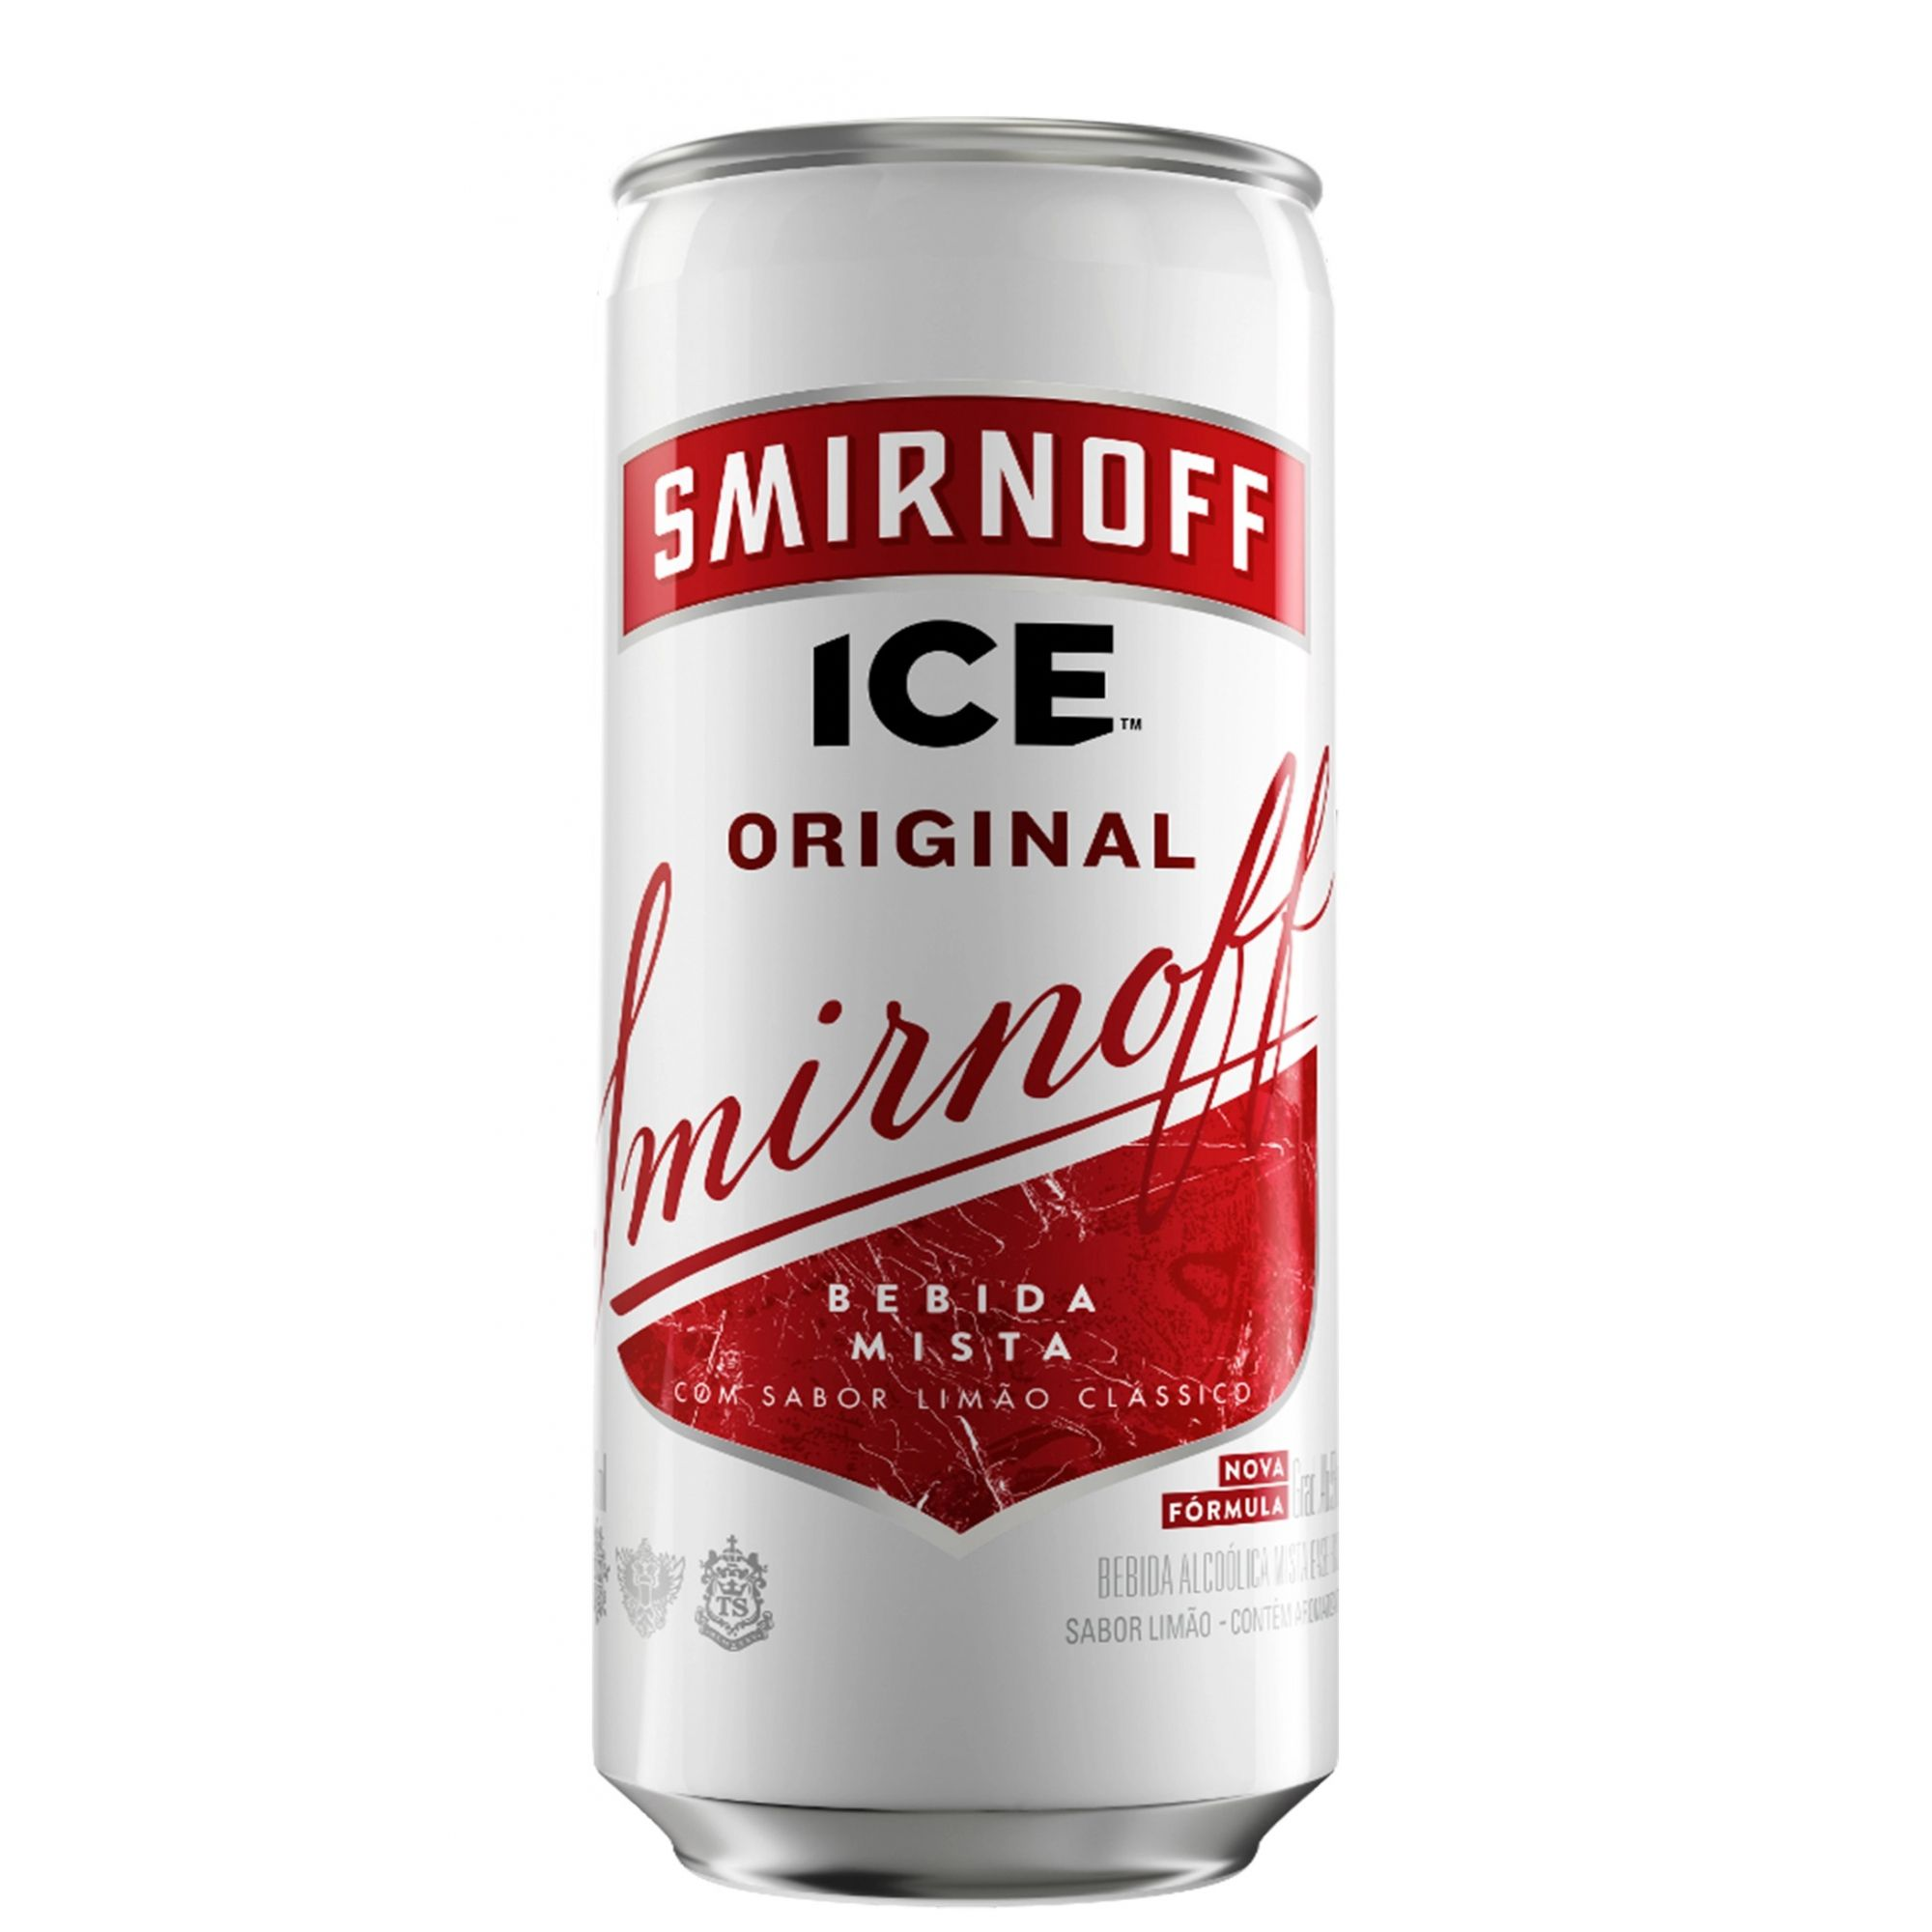 Smirnoff Ice Lata 24x269ml